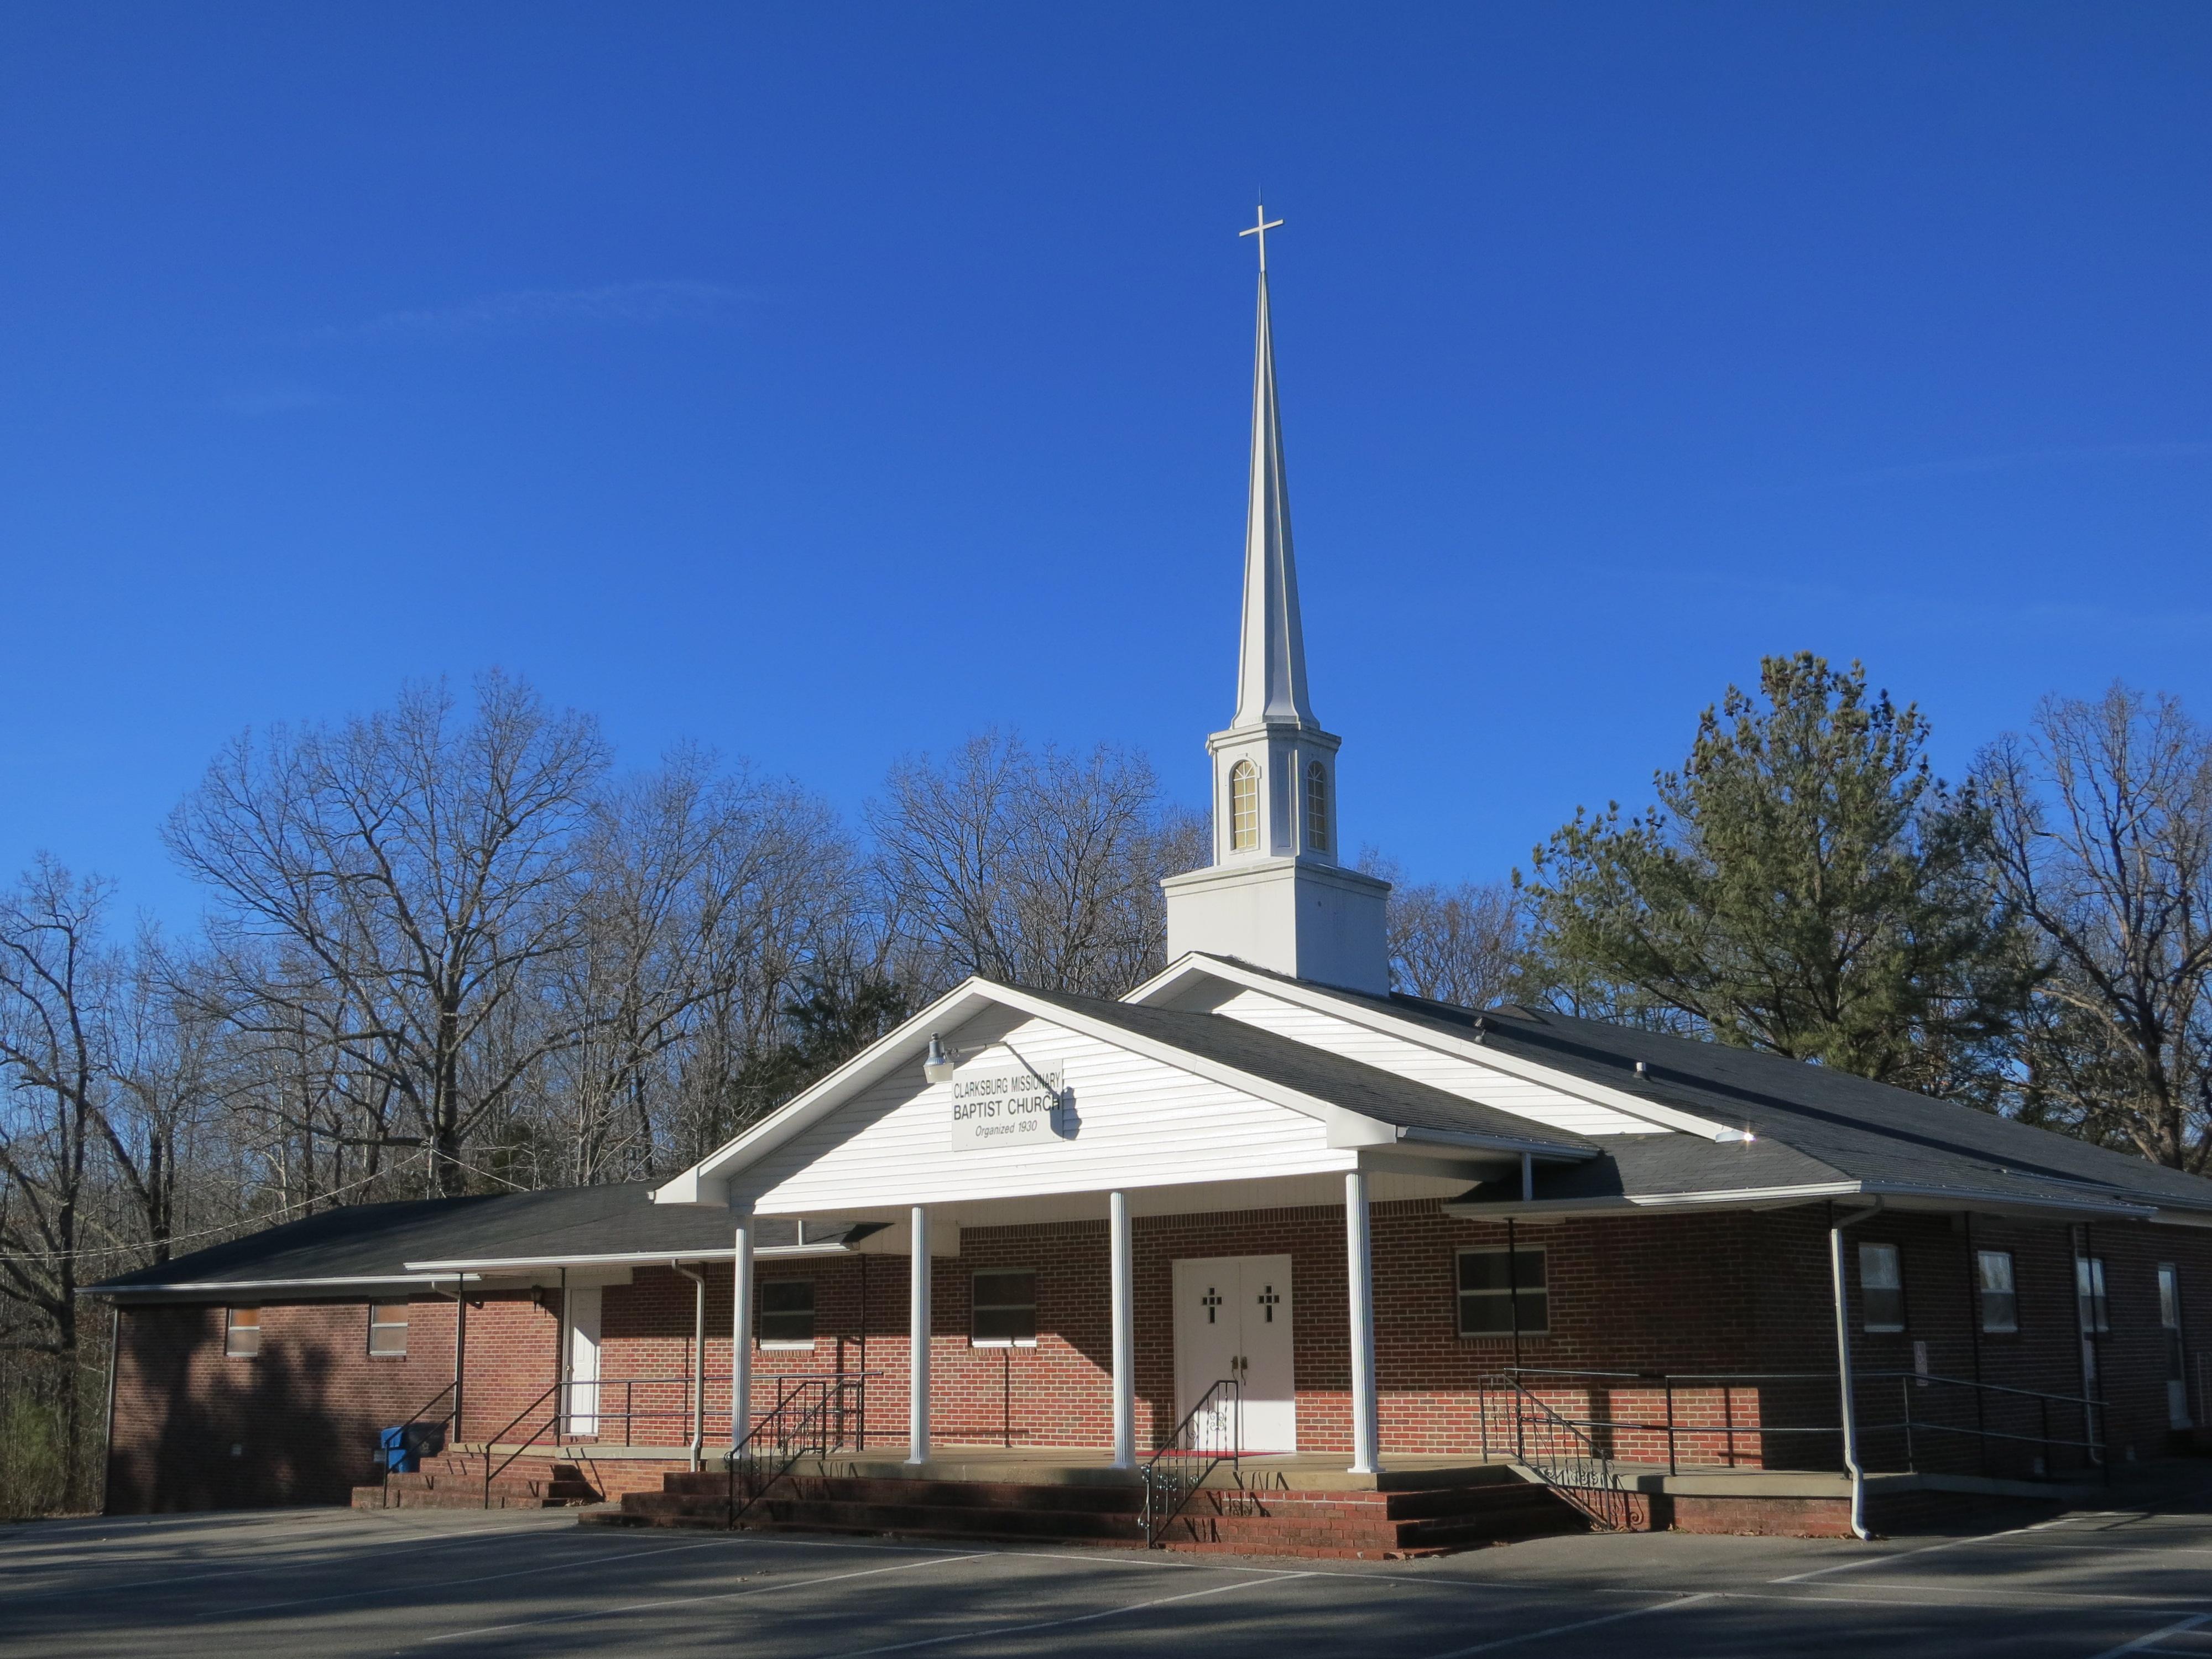 Tennessee carroll county clarksburg - Missionary_baptist_church Jpg Clarksburg Missionary Baptist Church